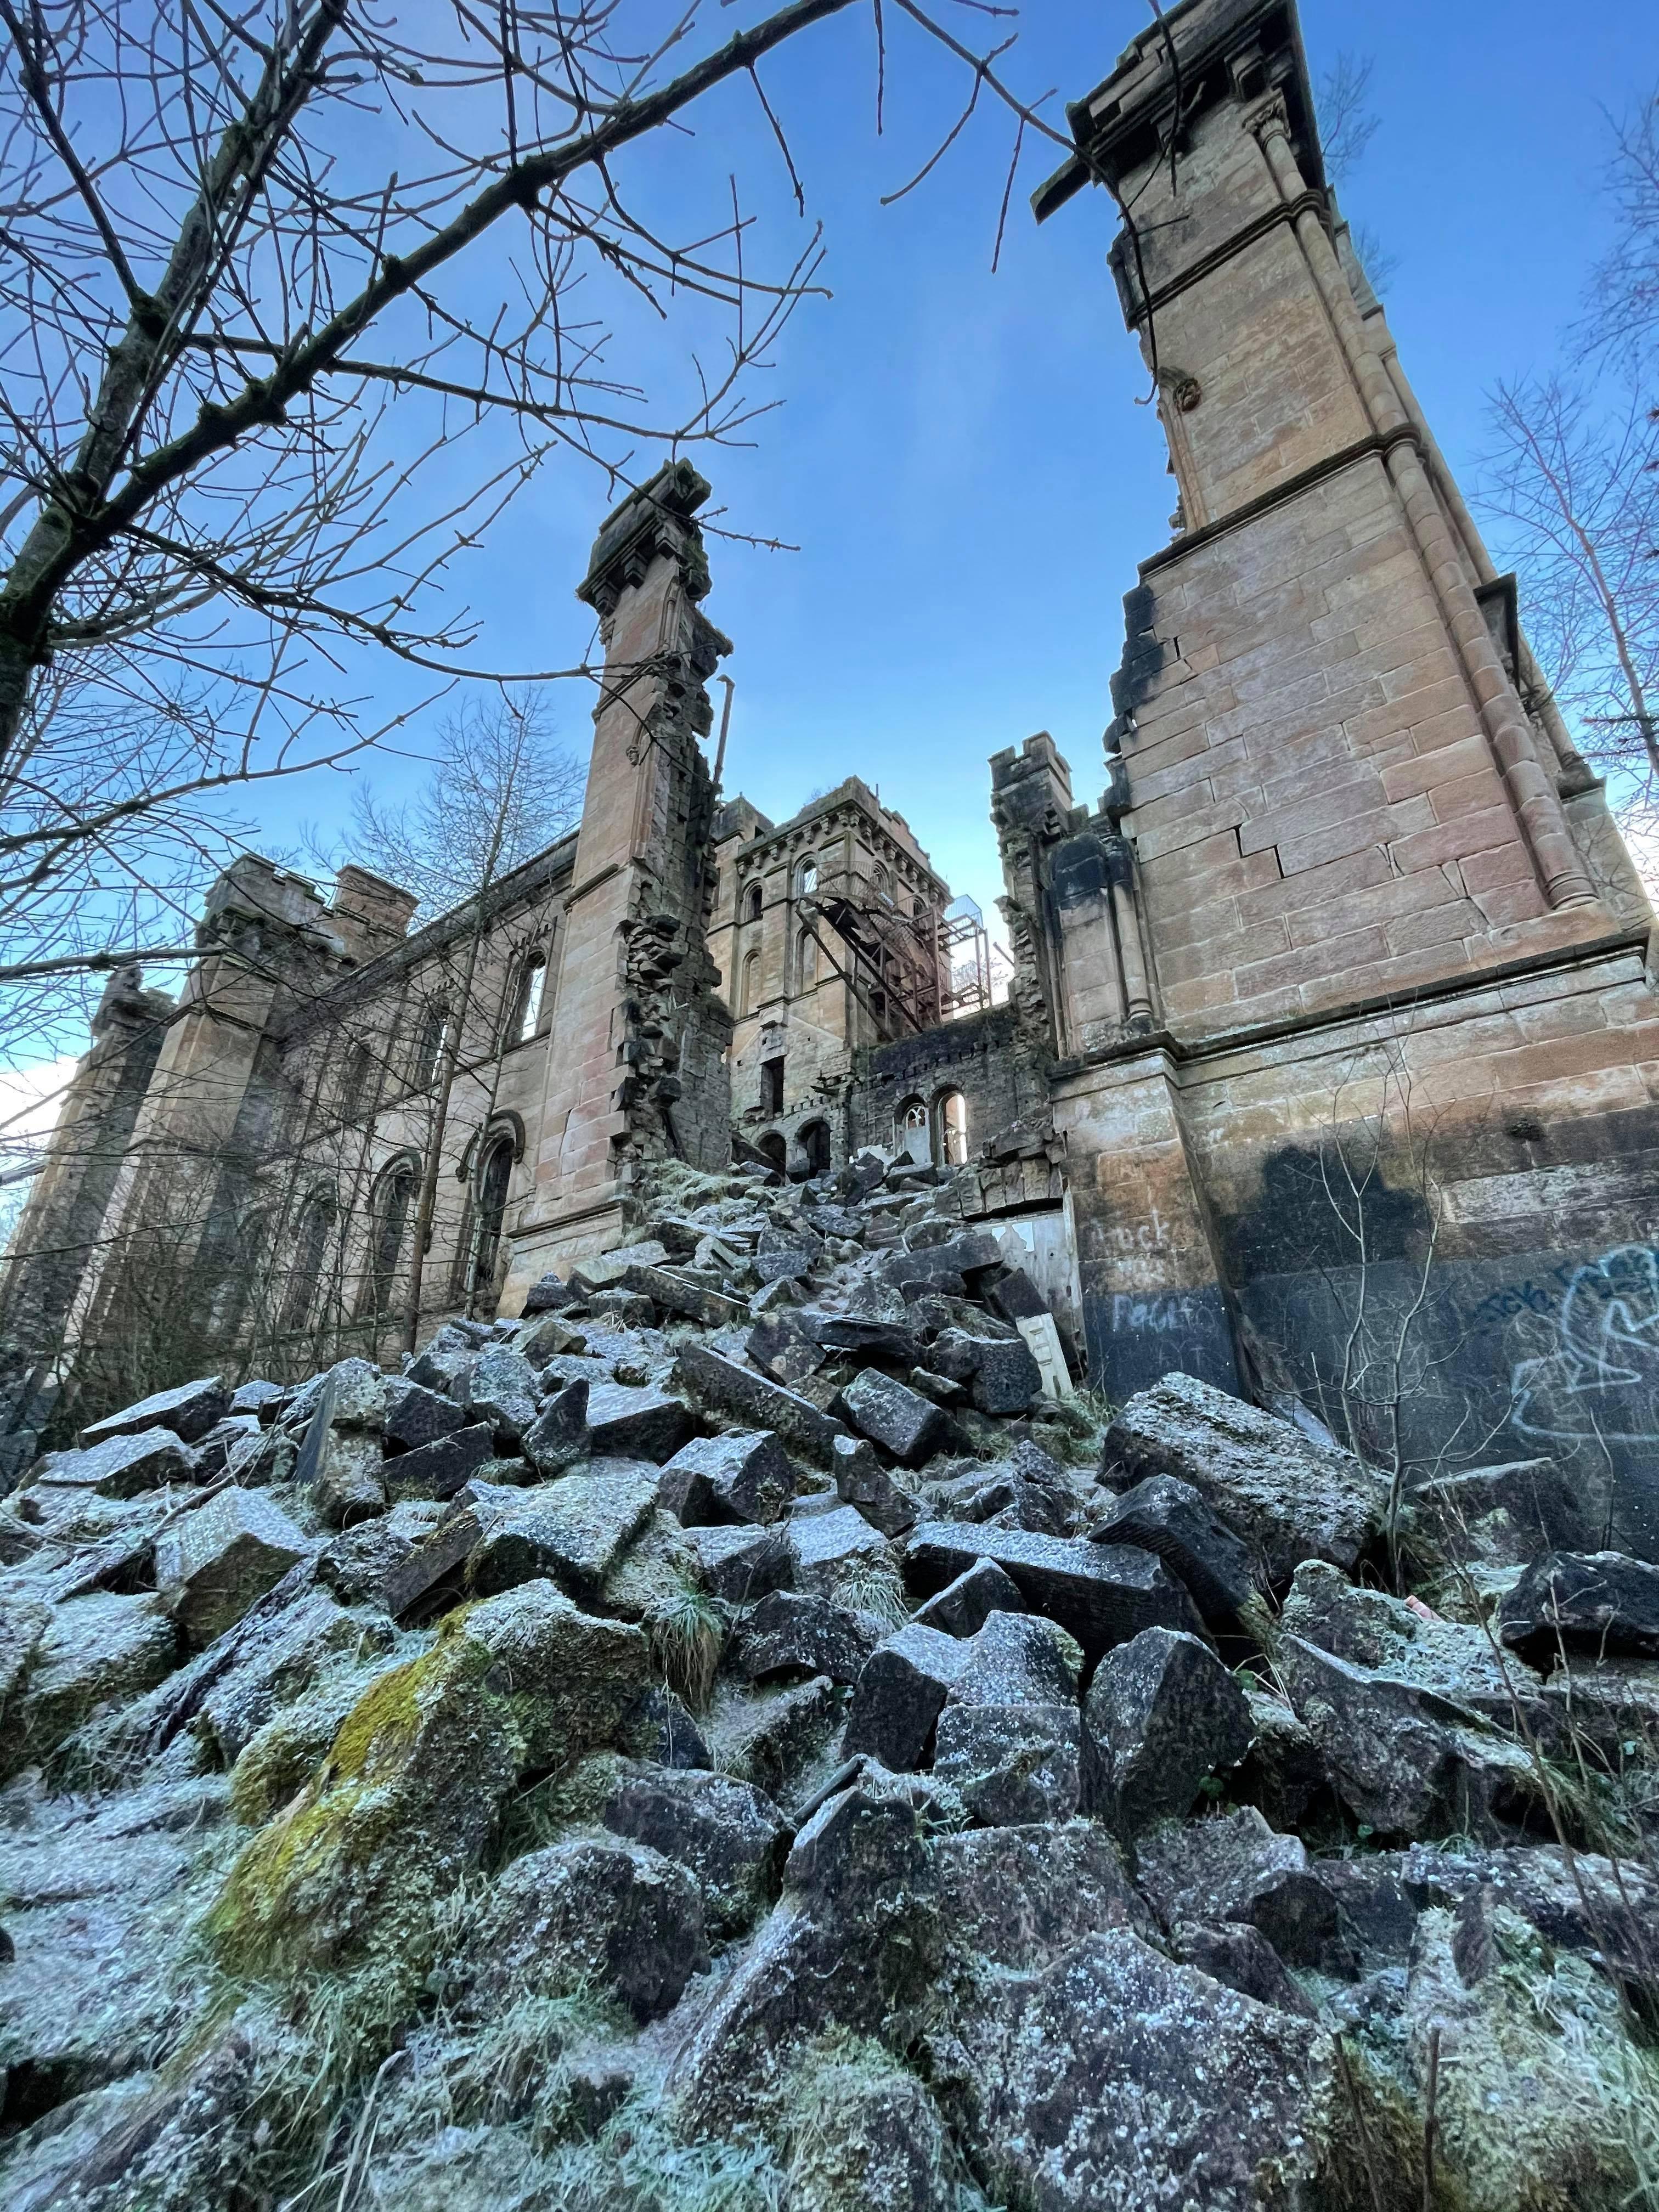 Ruined Wall Lennox Town Hospital